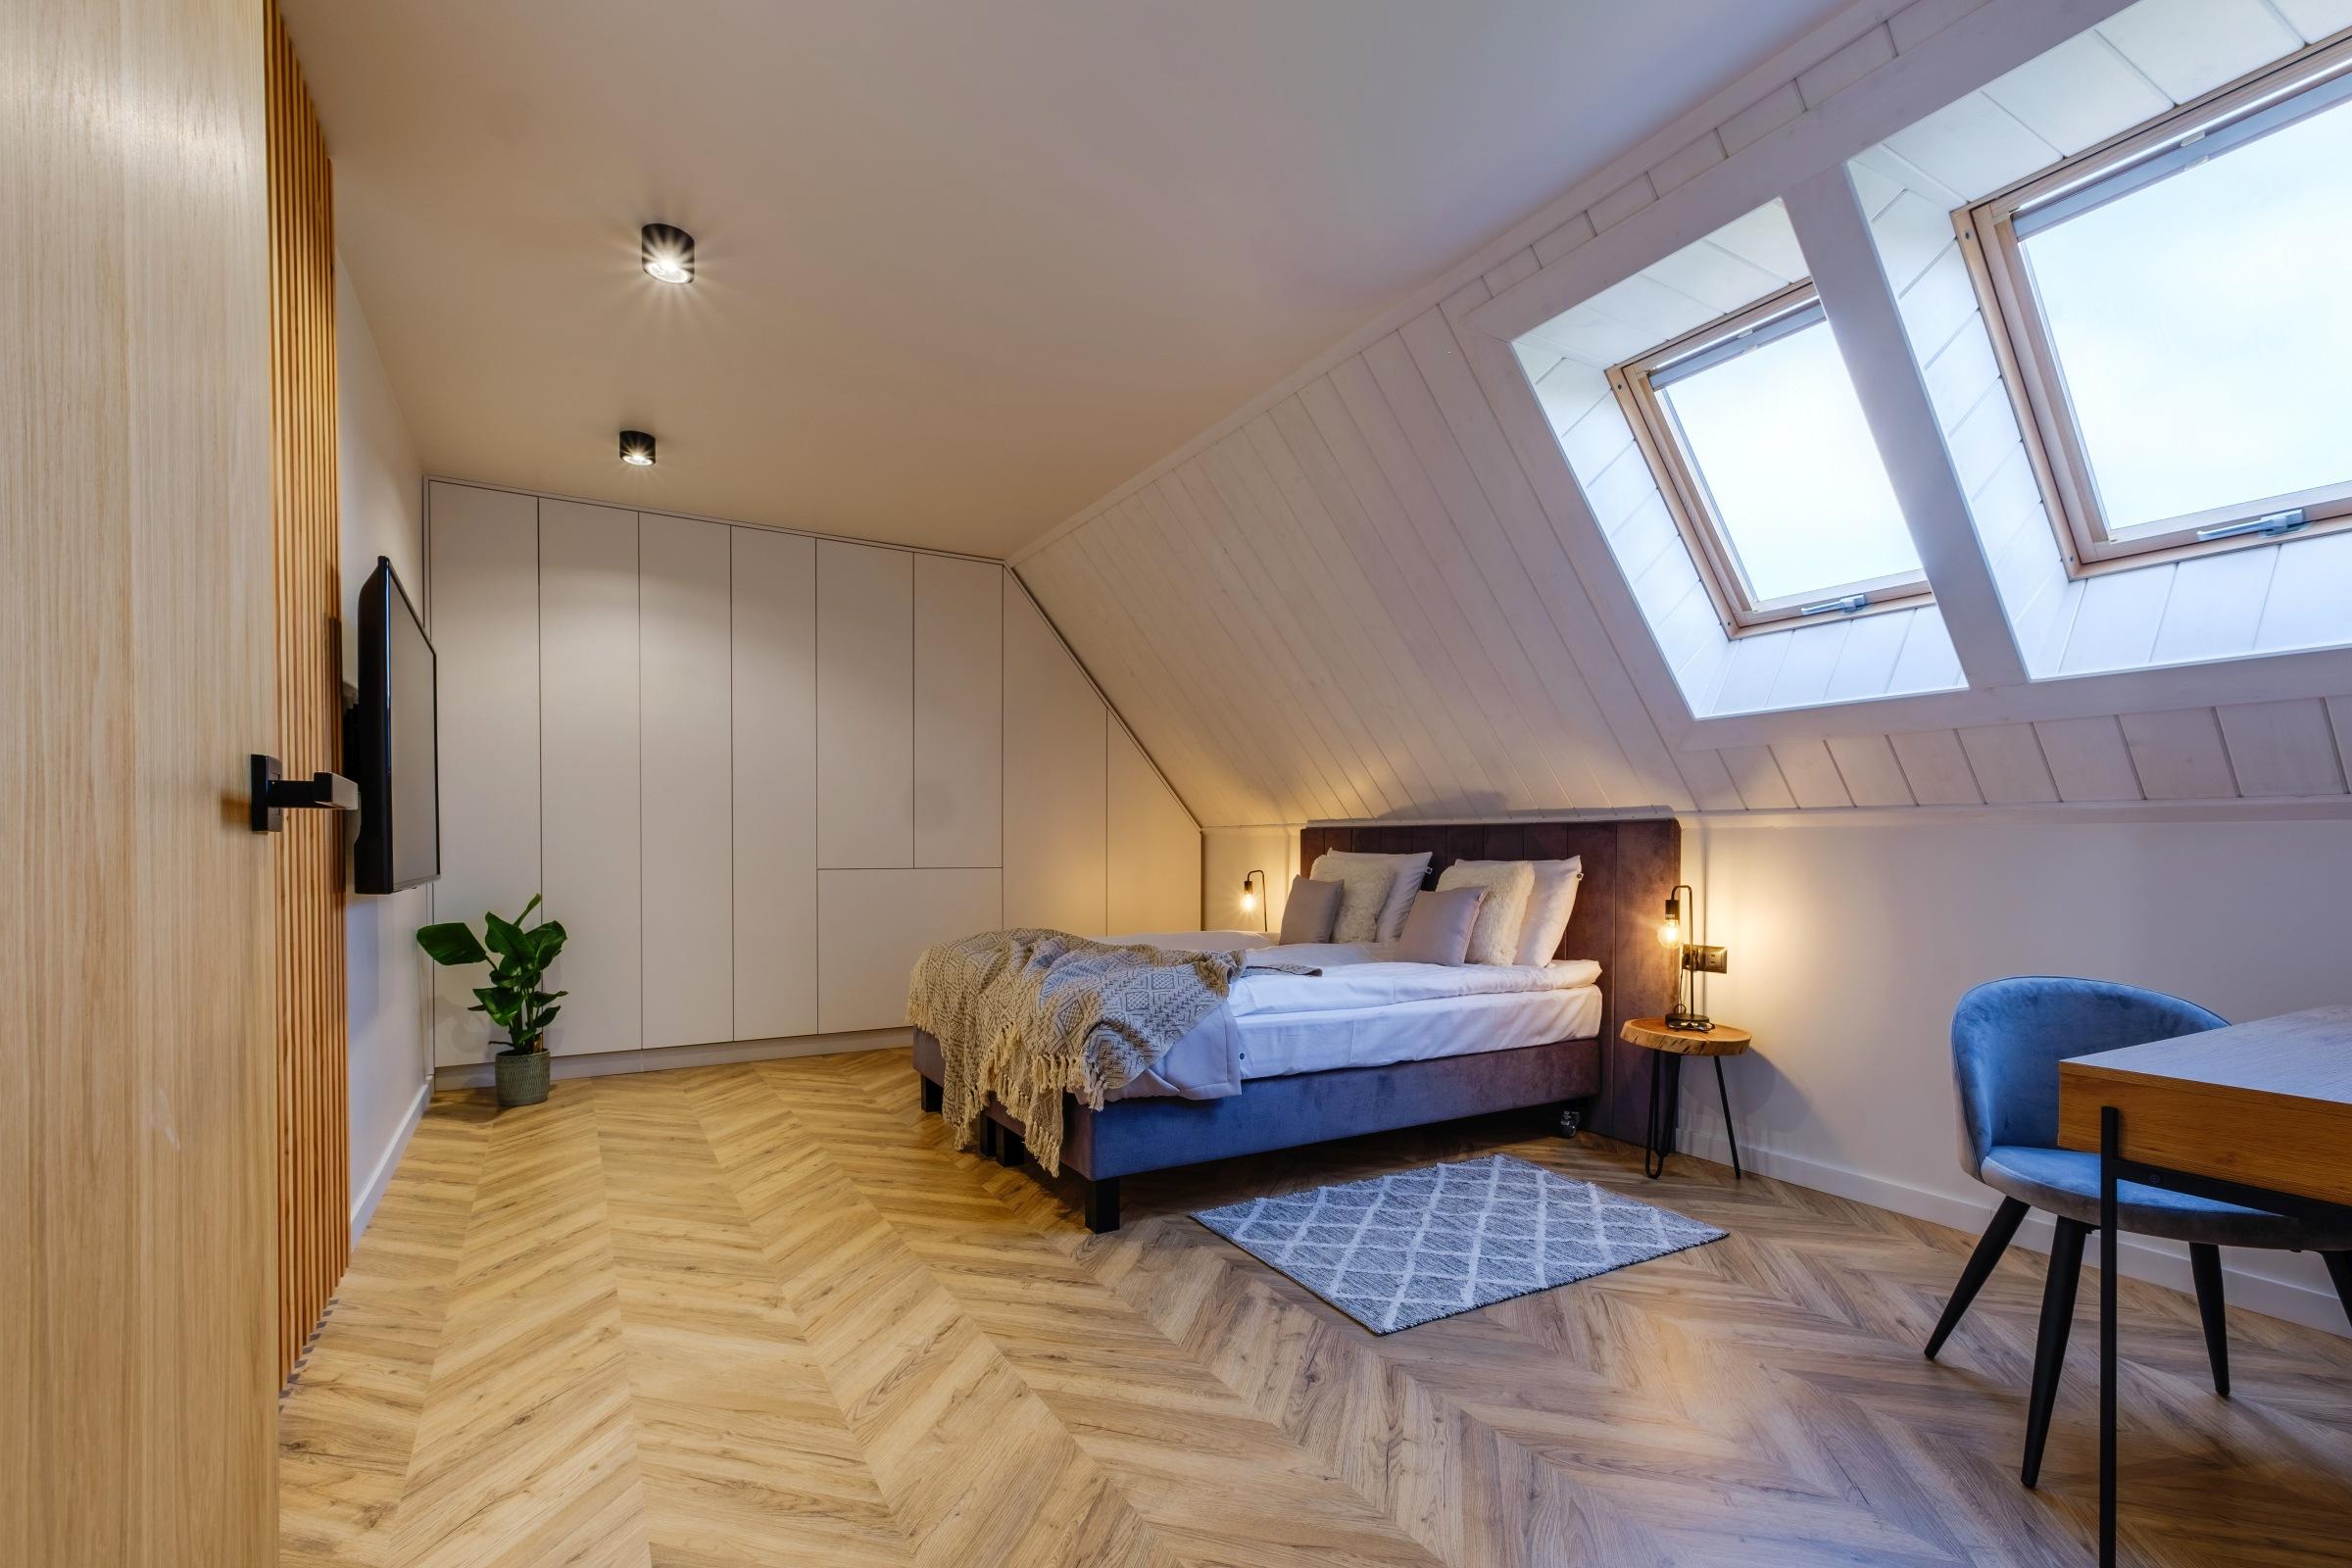 Apartamenty NOVA BIAŁKA Białka Tatrzańska apartament 8 sypialnia nr II 1